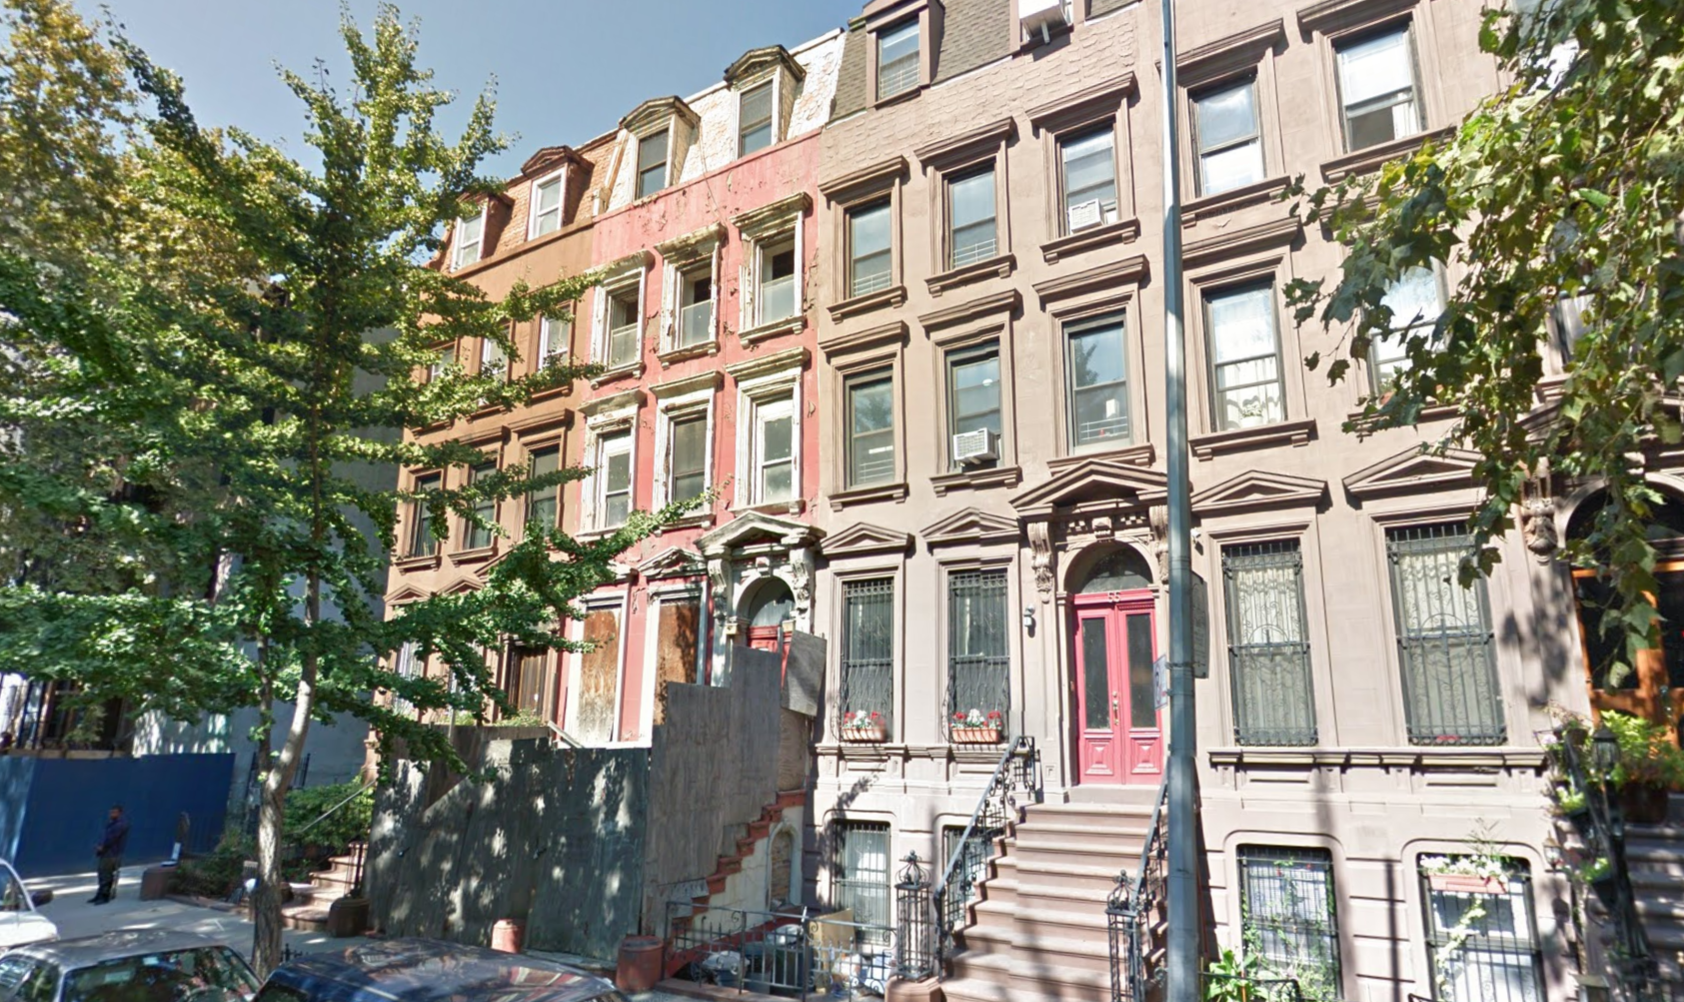 57 West 130th Street, image via Google Maps